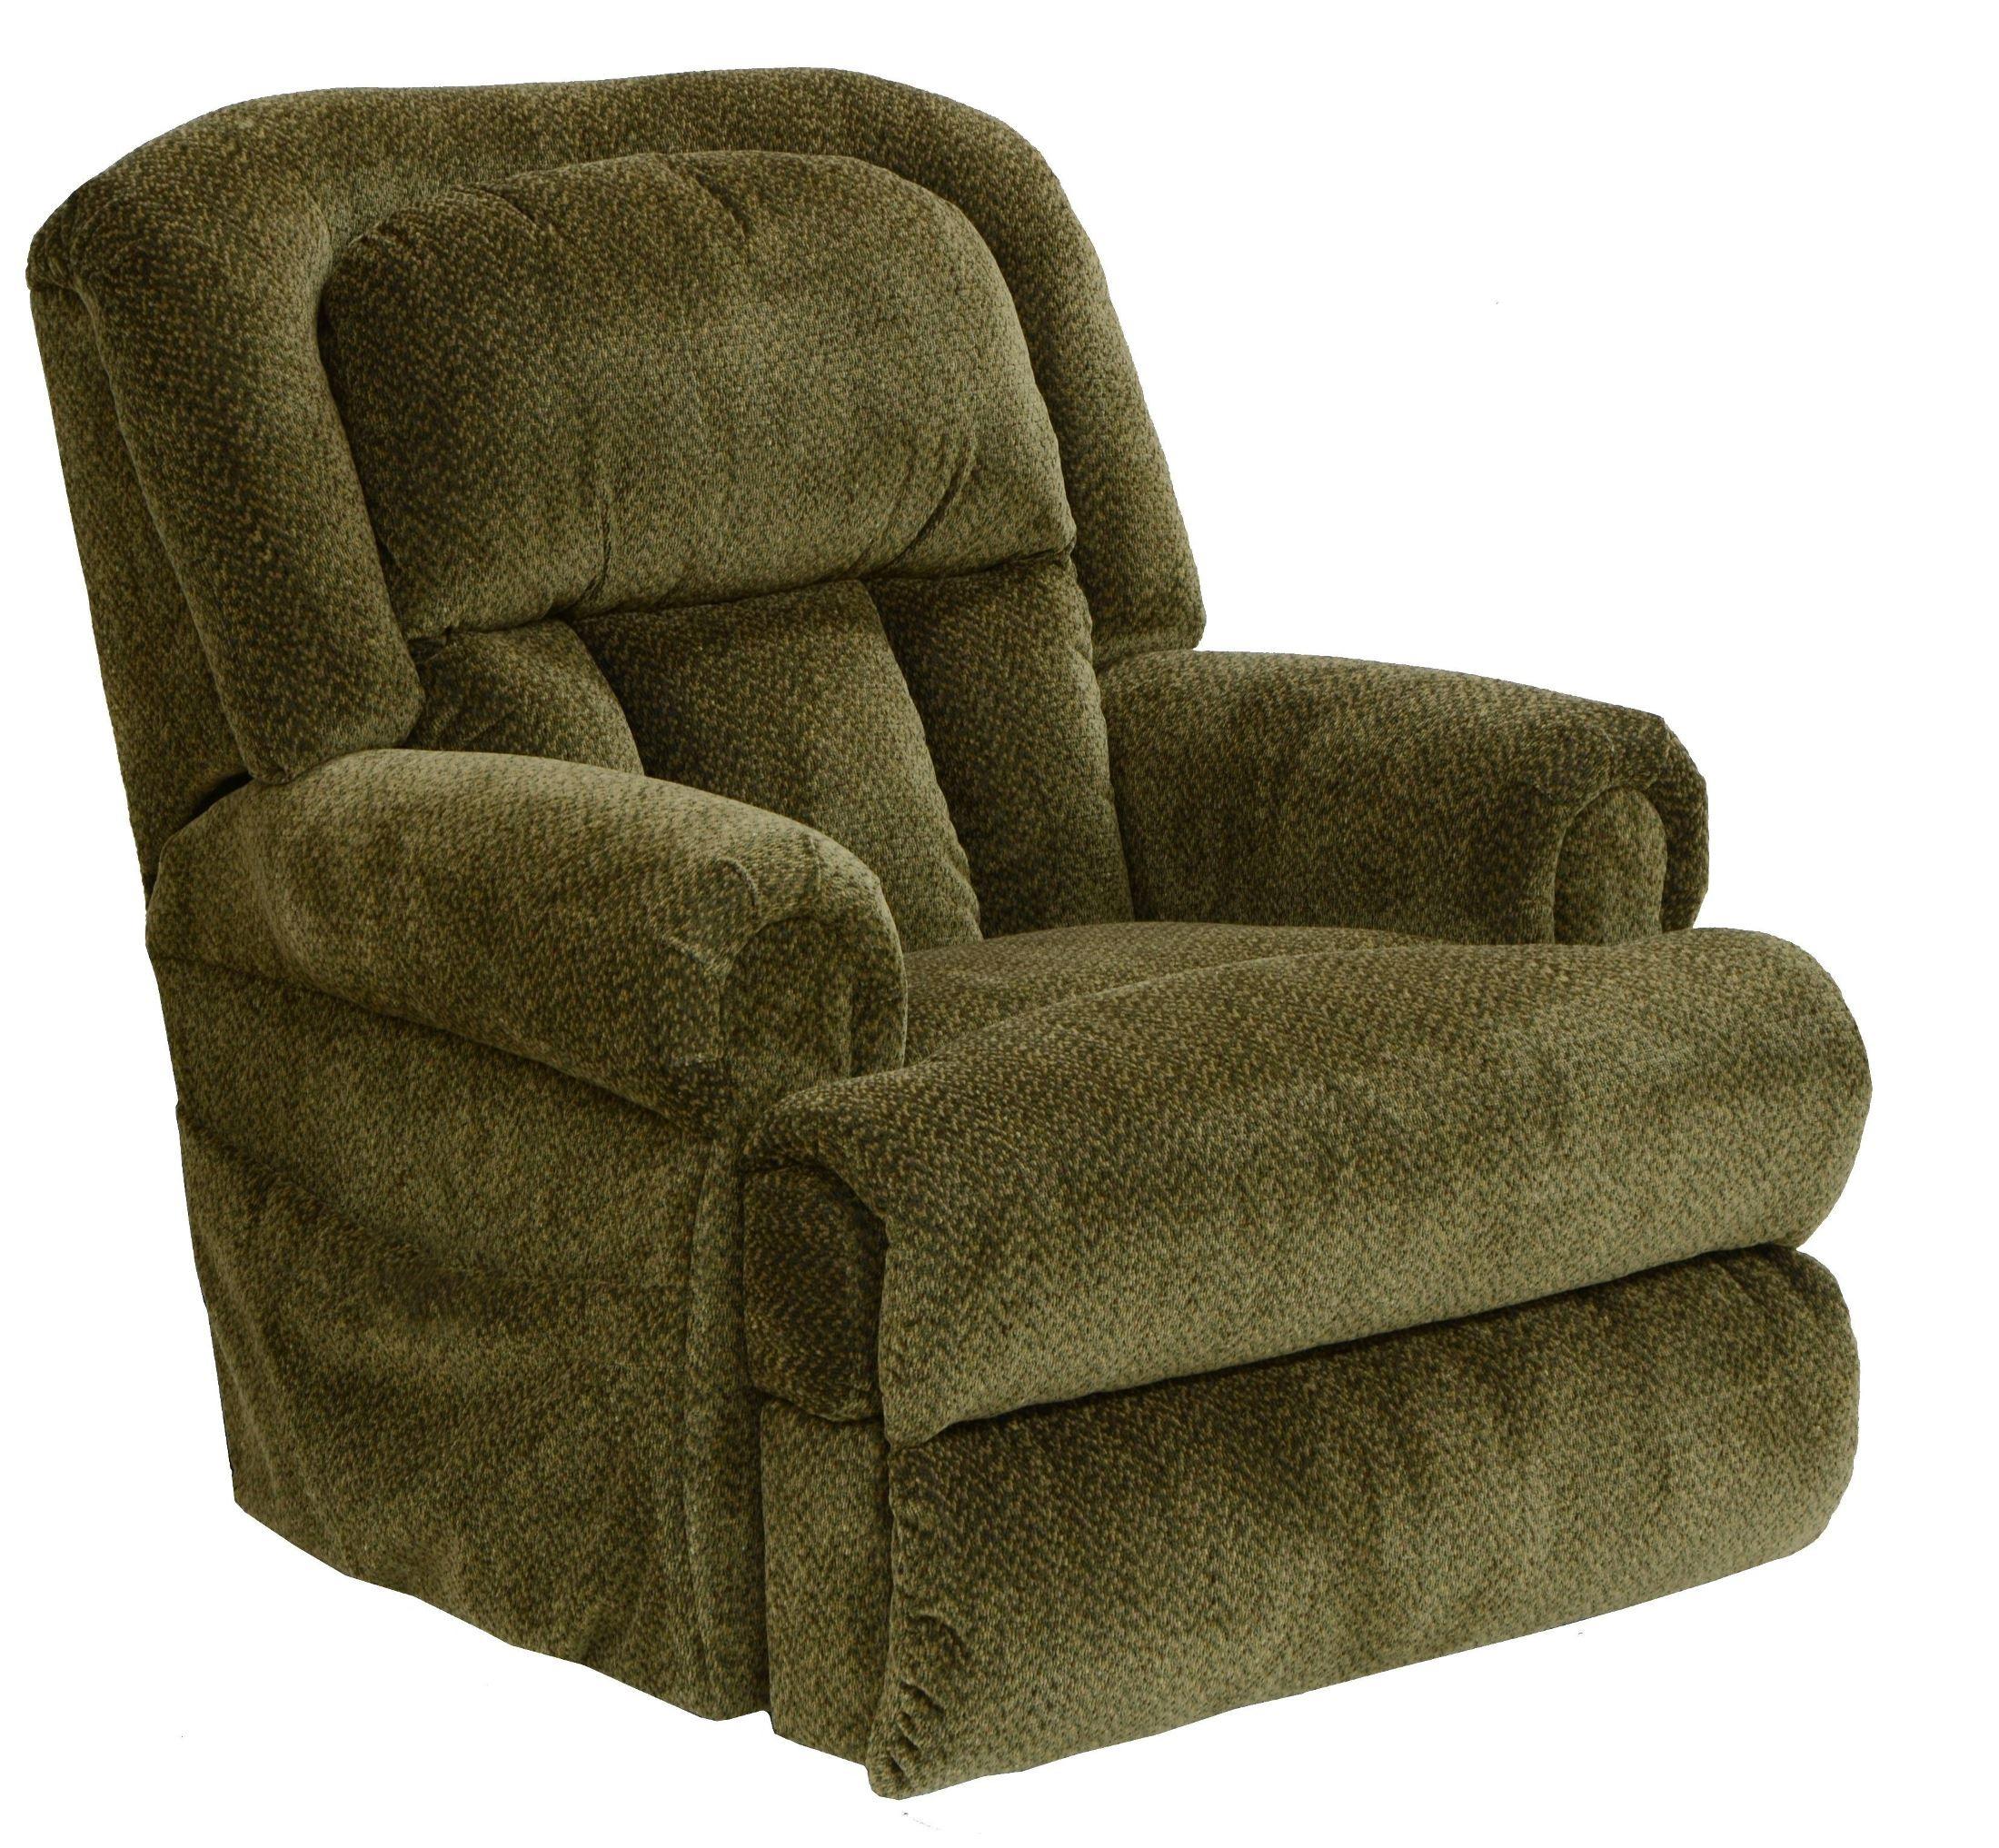 Burns basil power lift recliner from catnapper 4847176325 for Catnapper cloud nine chaise recliner